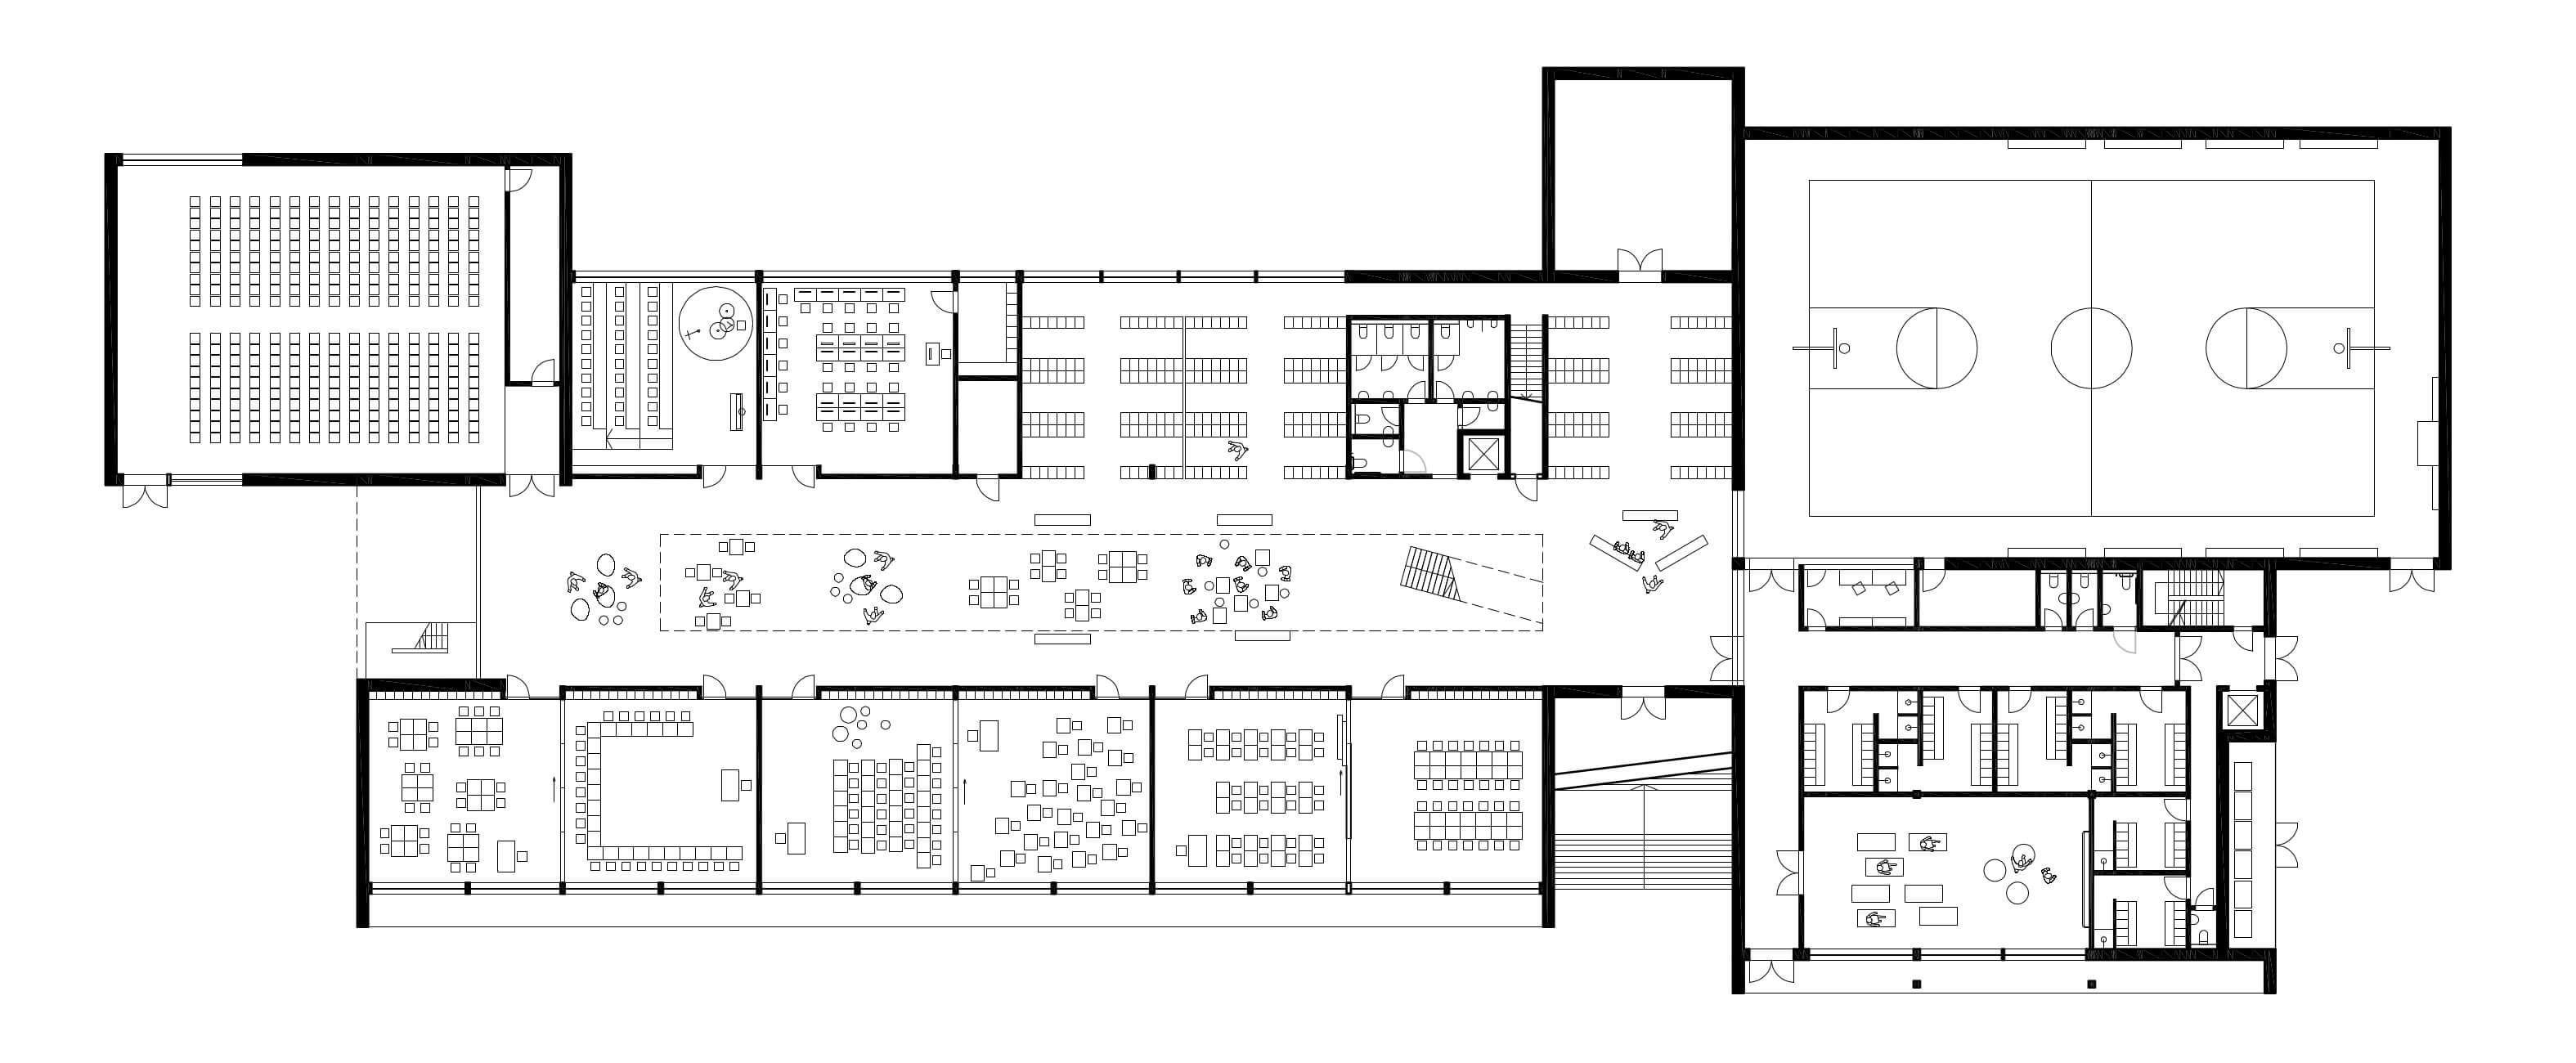 GAISS-arhitekti-Mezaparka-sakumskola-plan-00b